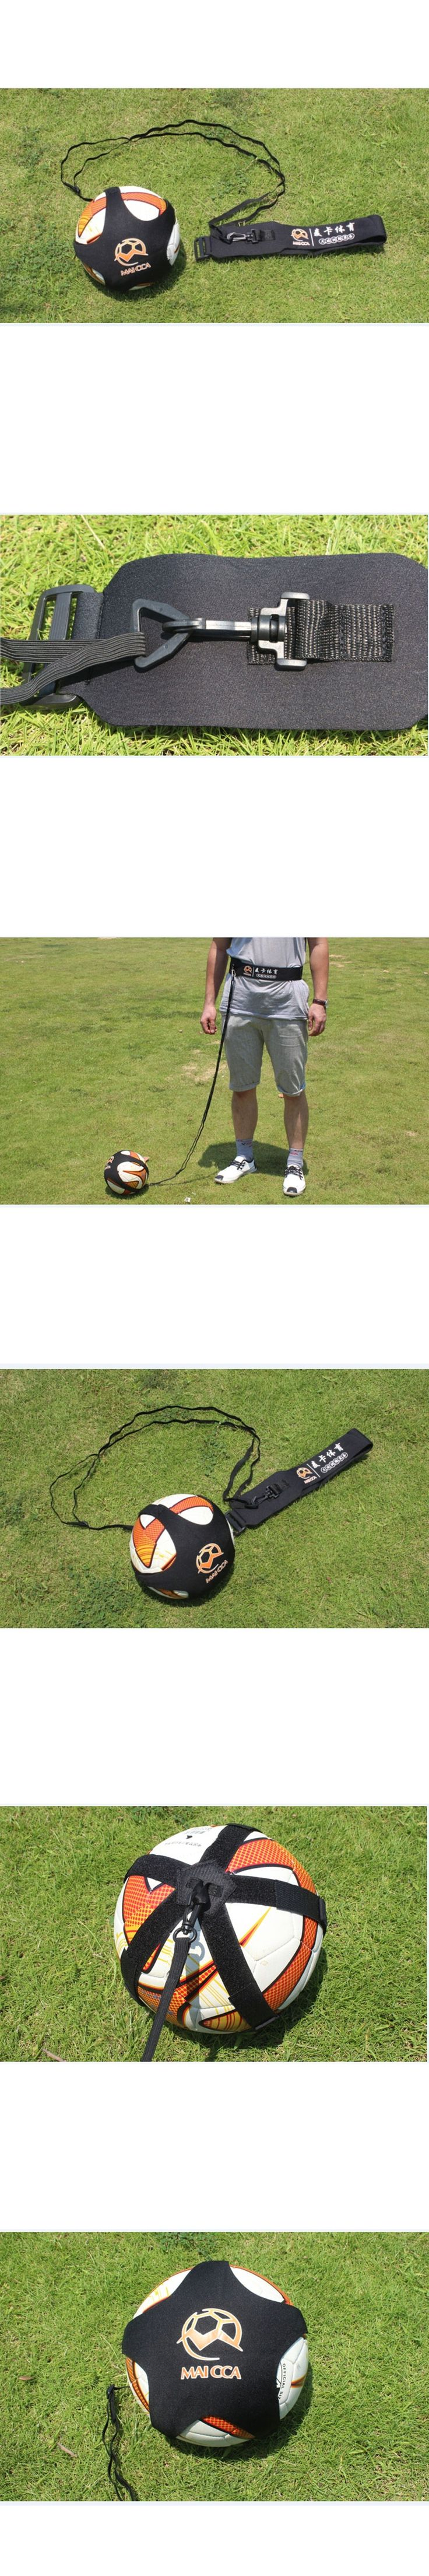 MAICCA Professional Football Training band belt rope net  Shoot Assistance Elastic Soccer Training Rope Equipment Wholesale